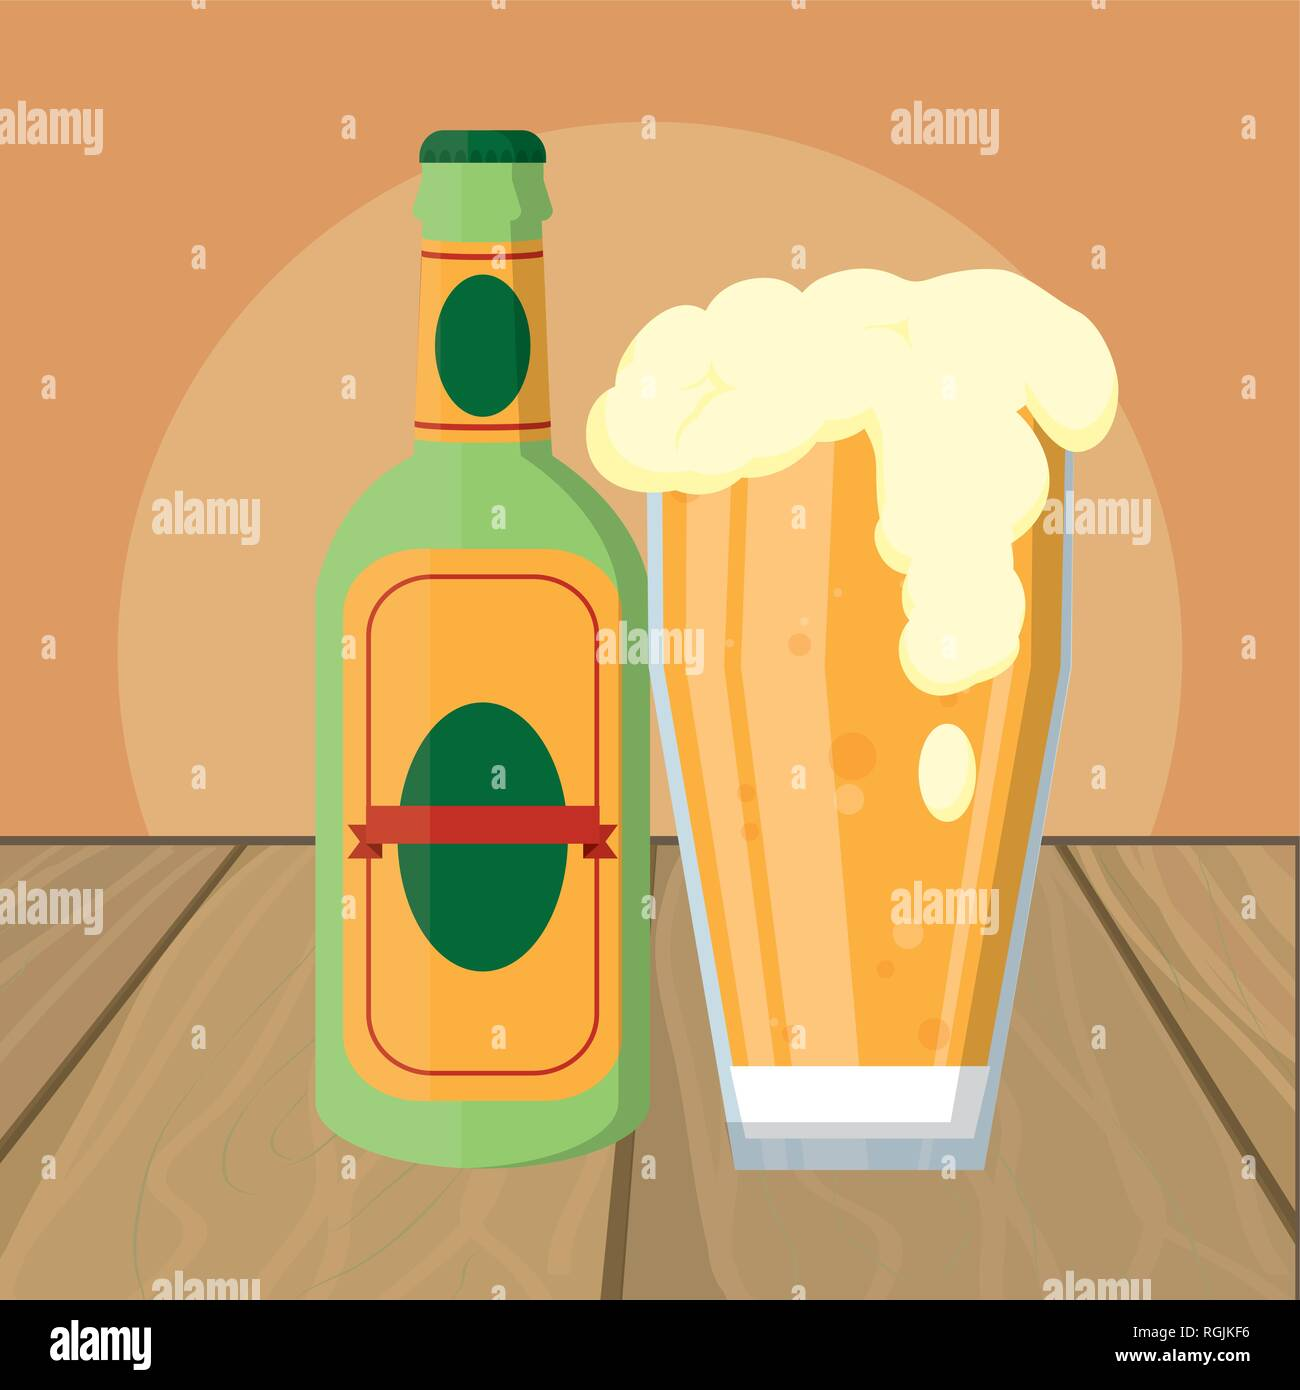 alcoholic drink cartoon Stock Vector